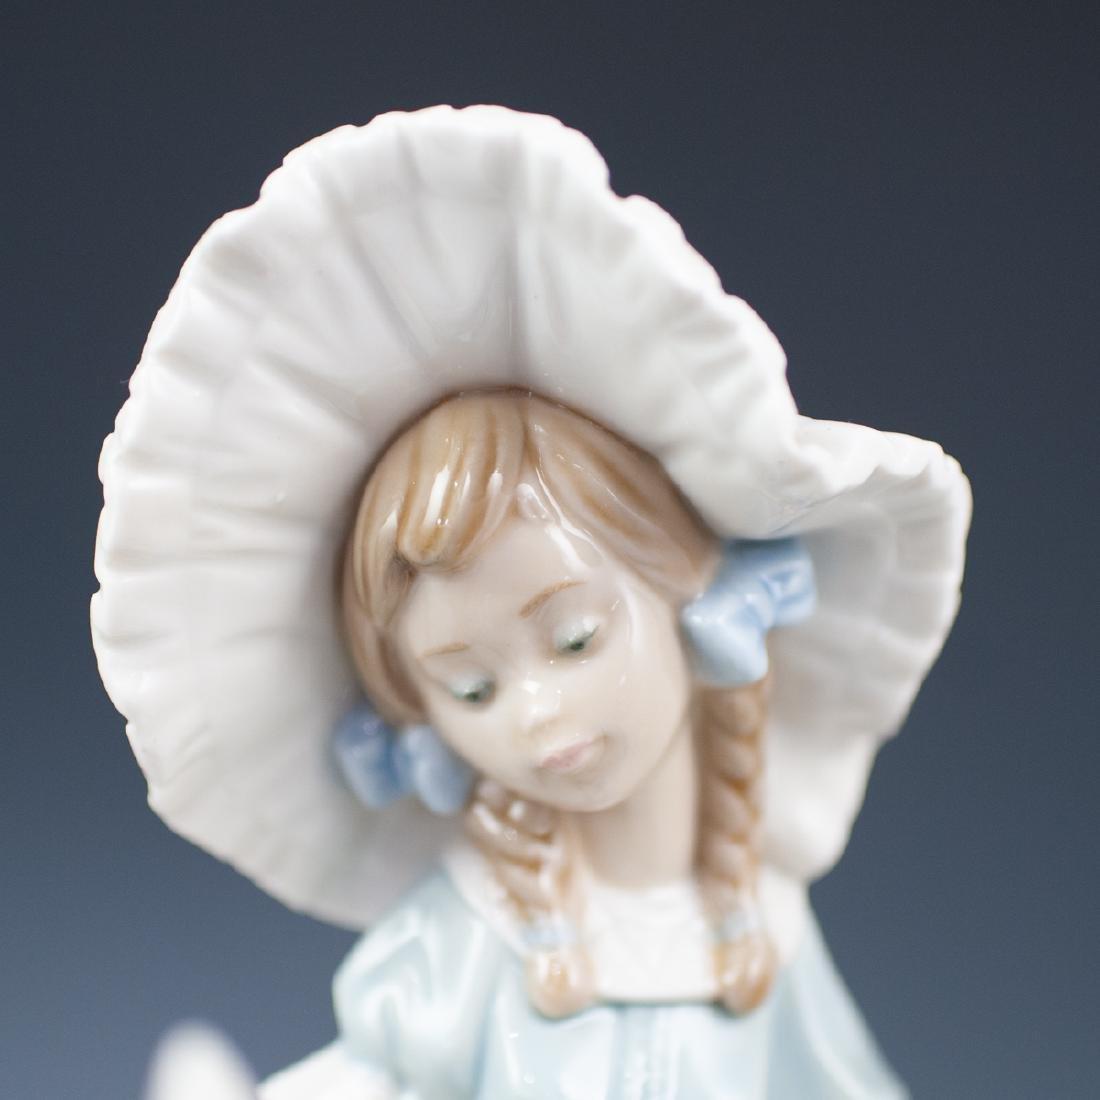 Pair Of Lladro Porcelain Figurines - 5